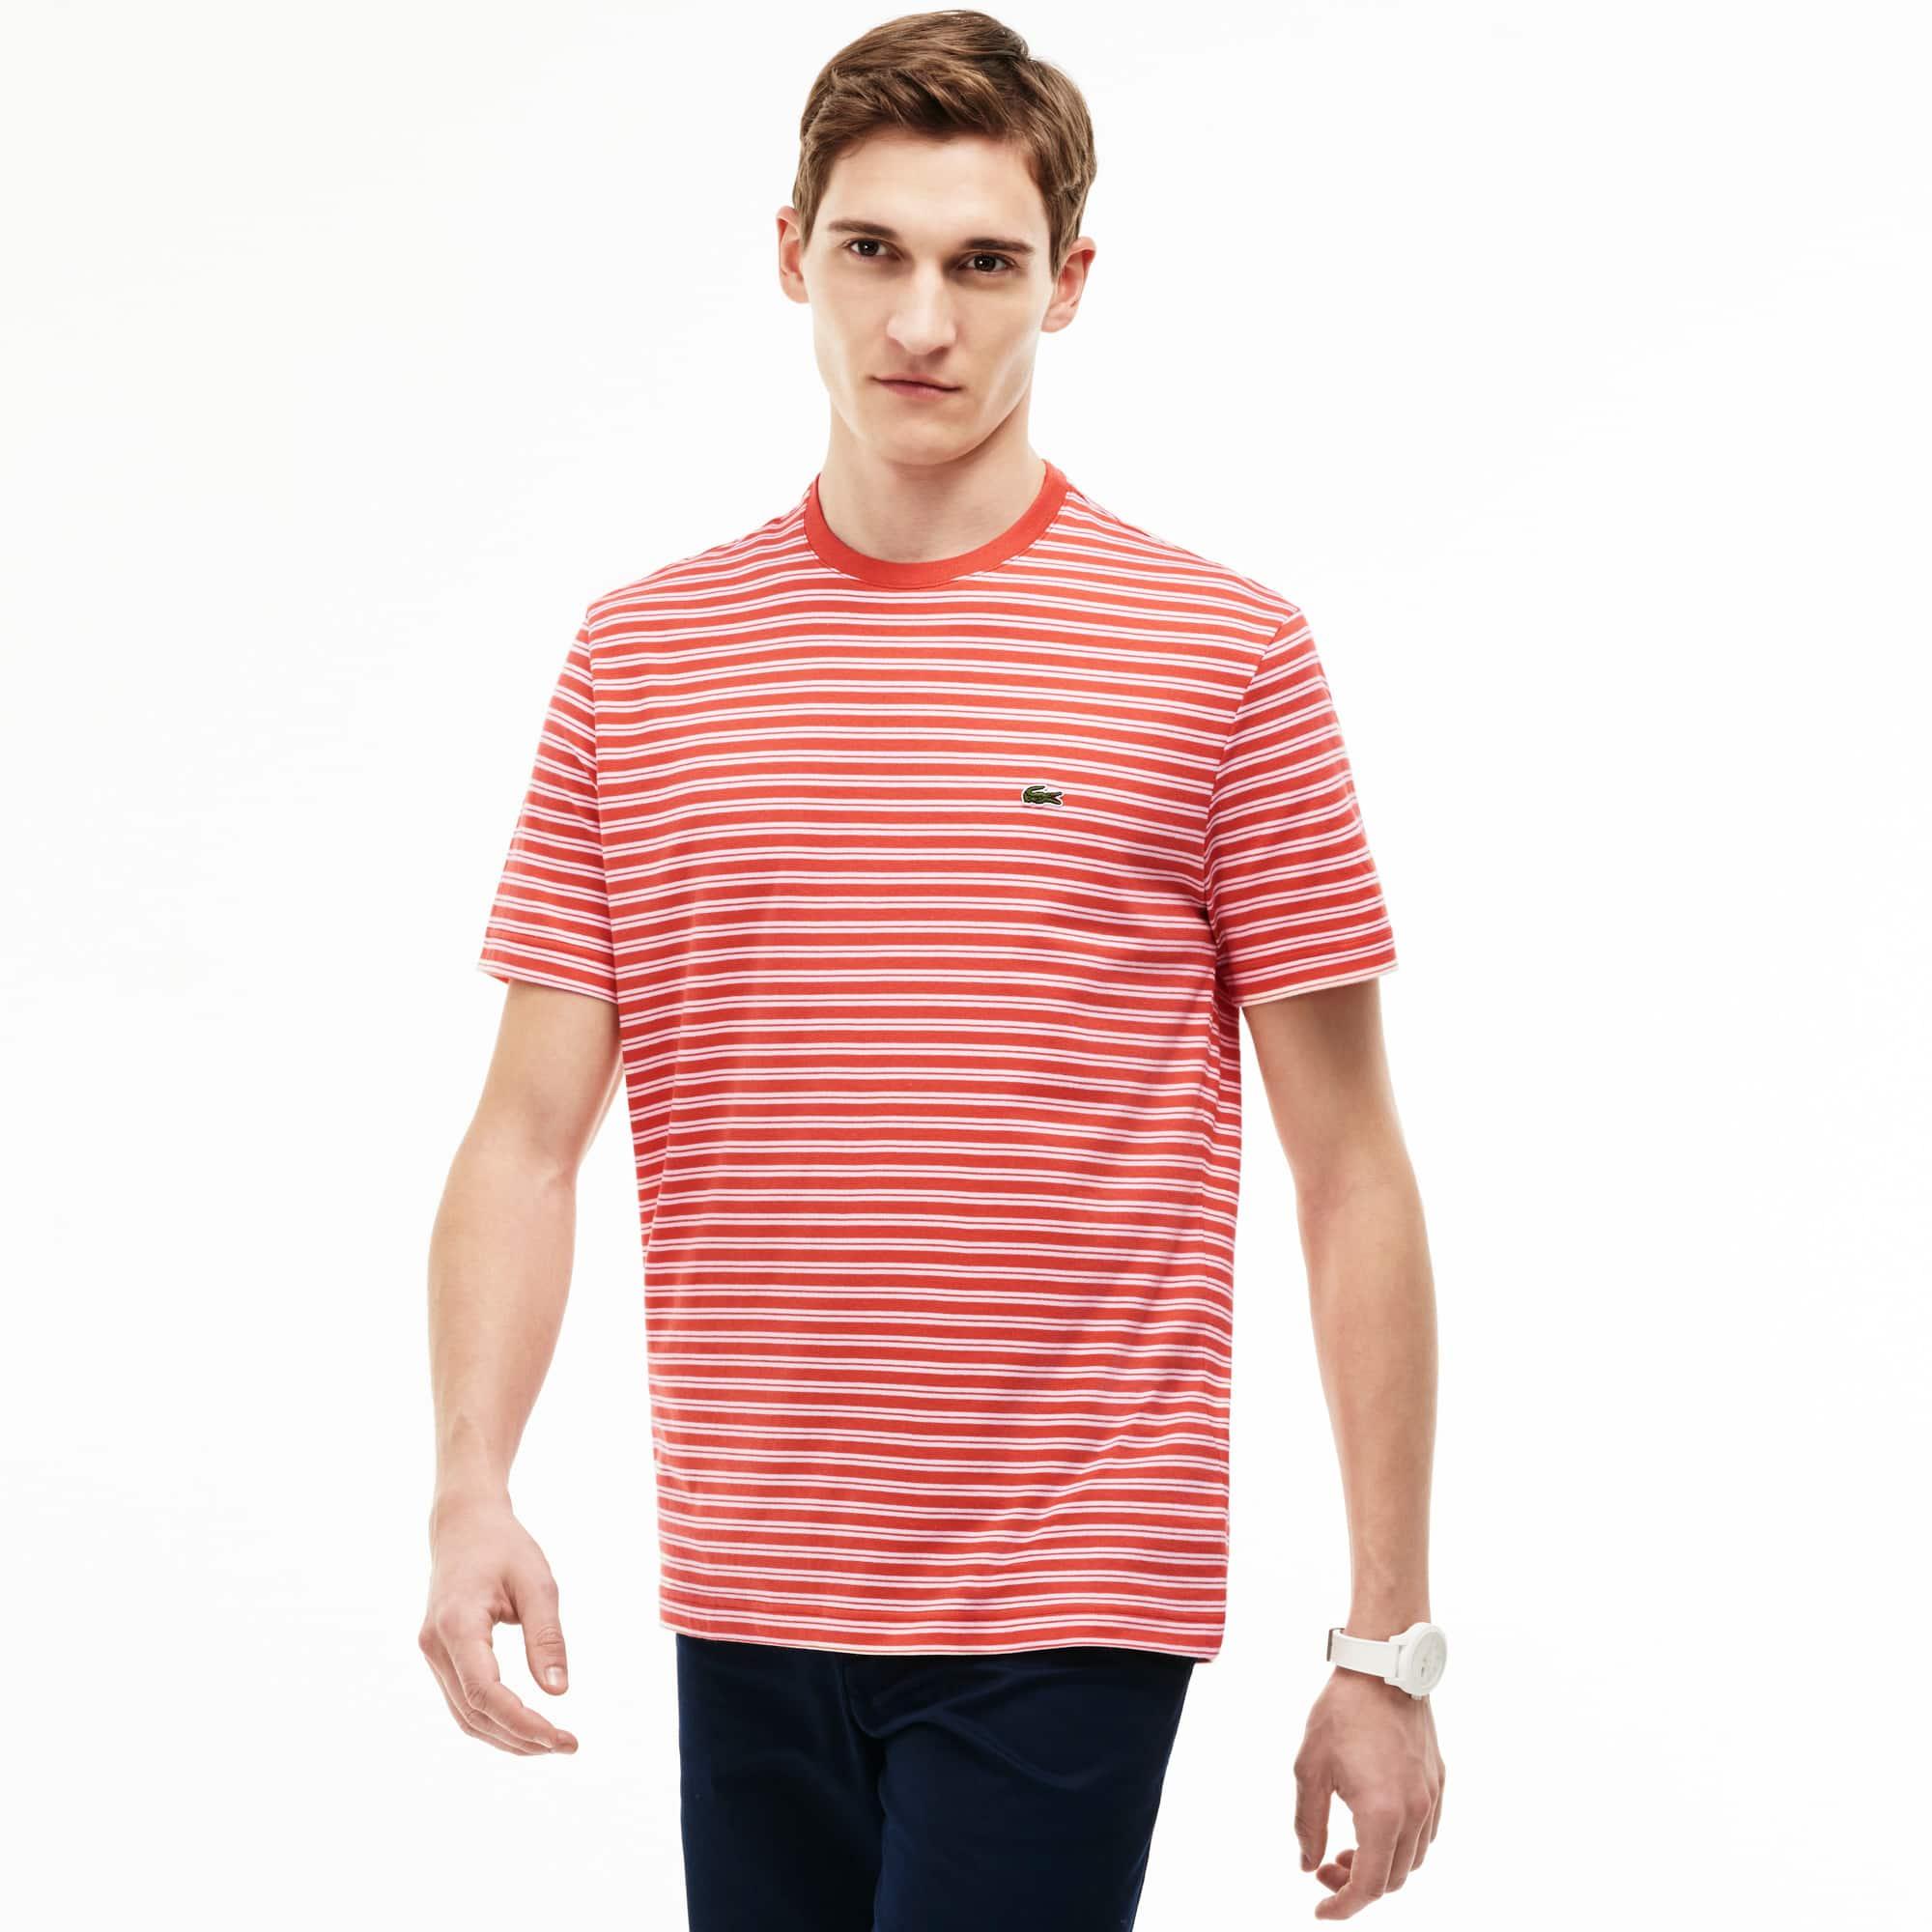 Men's Stripe Crewneck Jersey T-Shirt